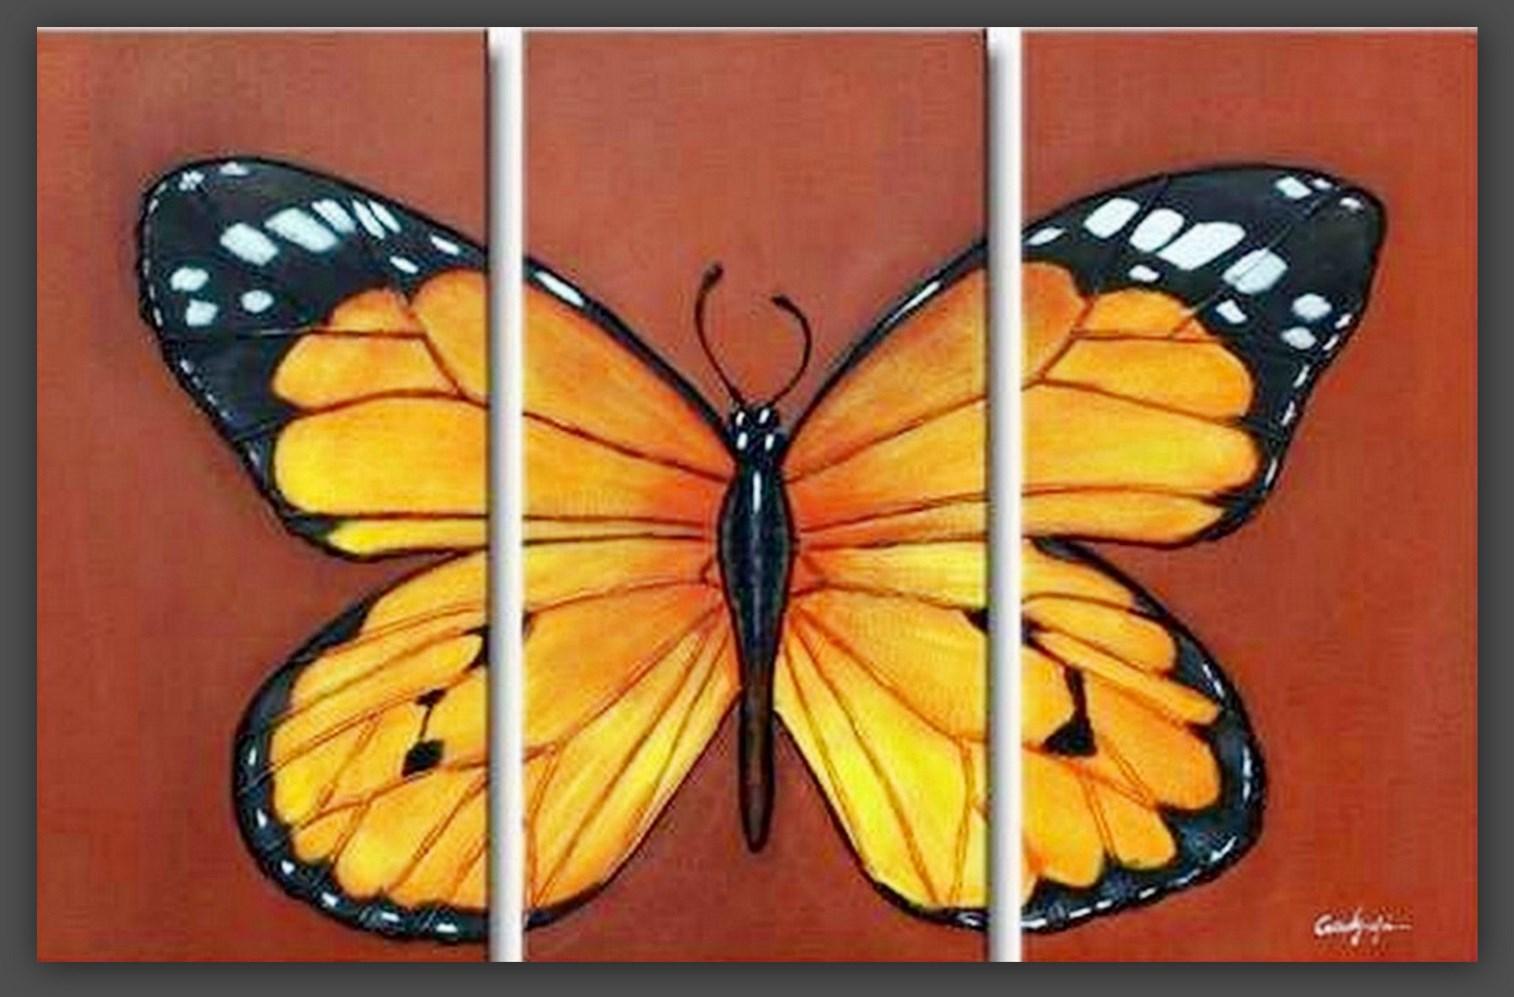 Arte pinturas leo cuadros tr pticos modernos - Cuadros modernos ...